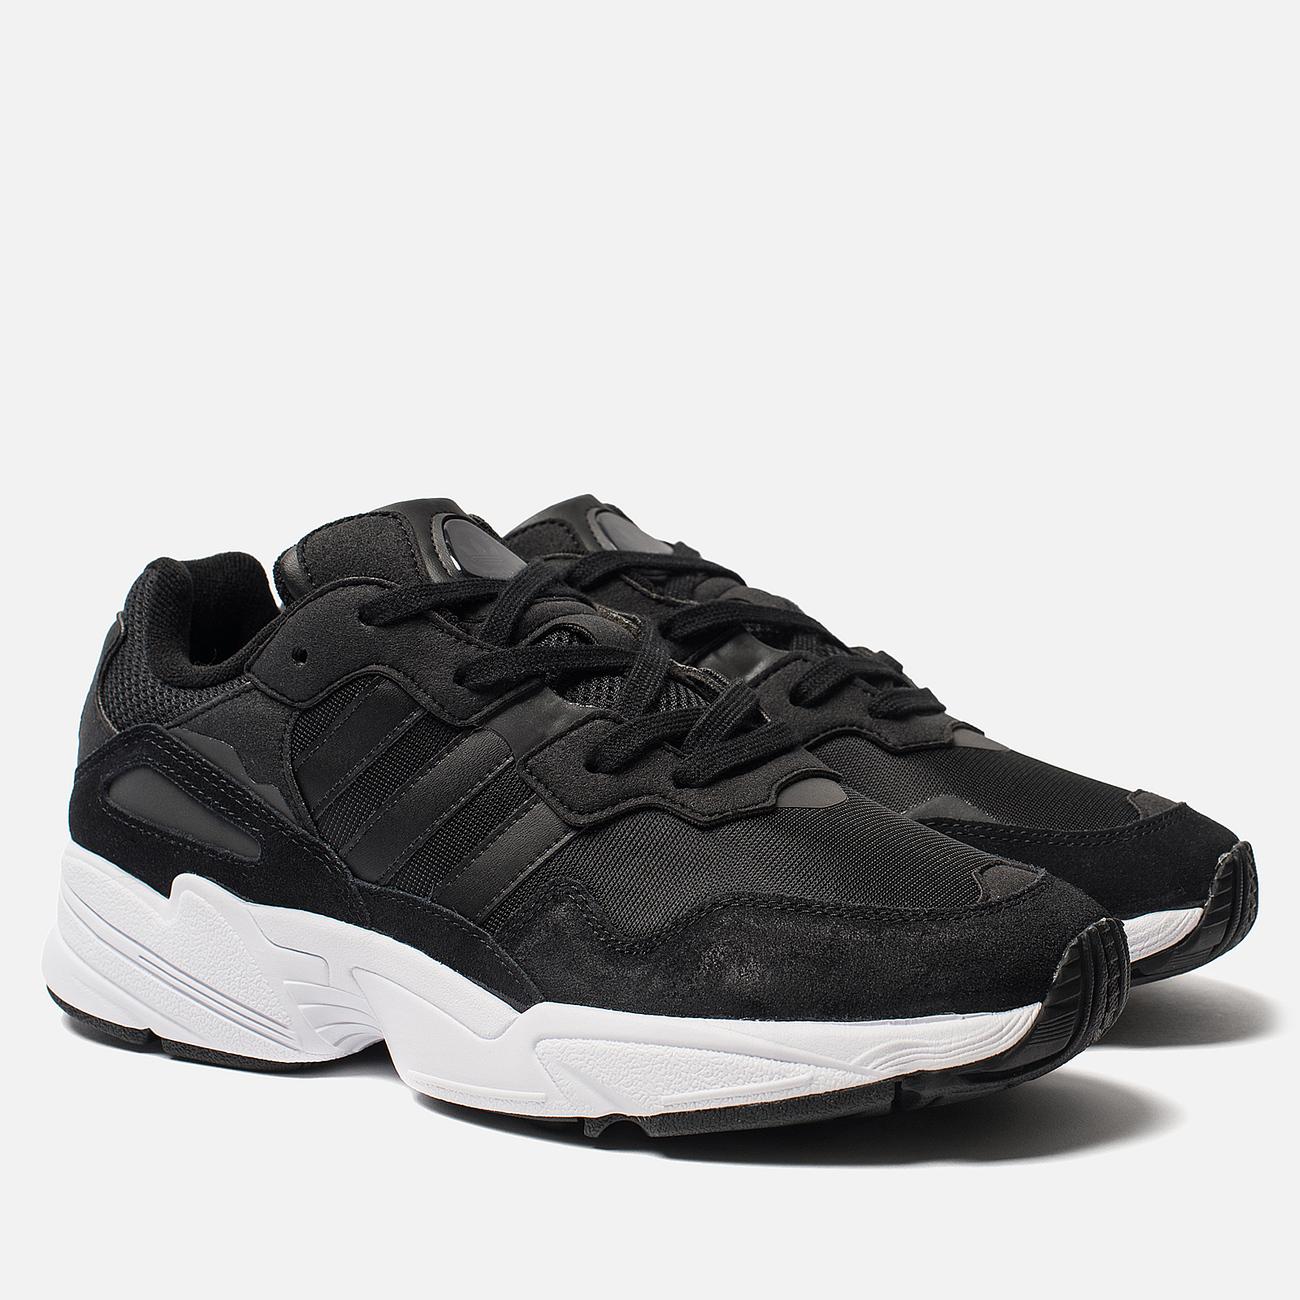 Кроссовки adidas Originals Yung-96 Core Black/Core Black/Crystal White